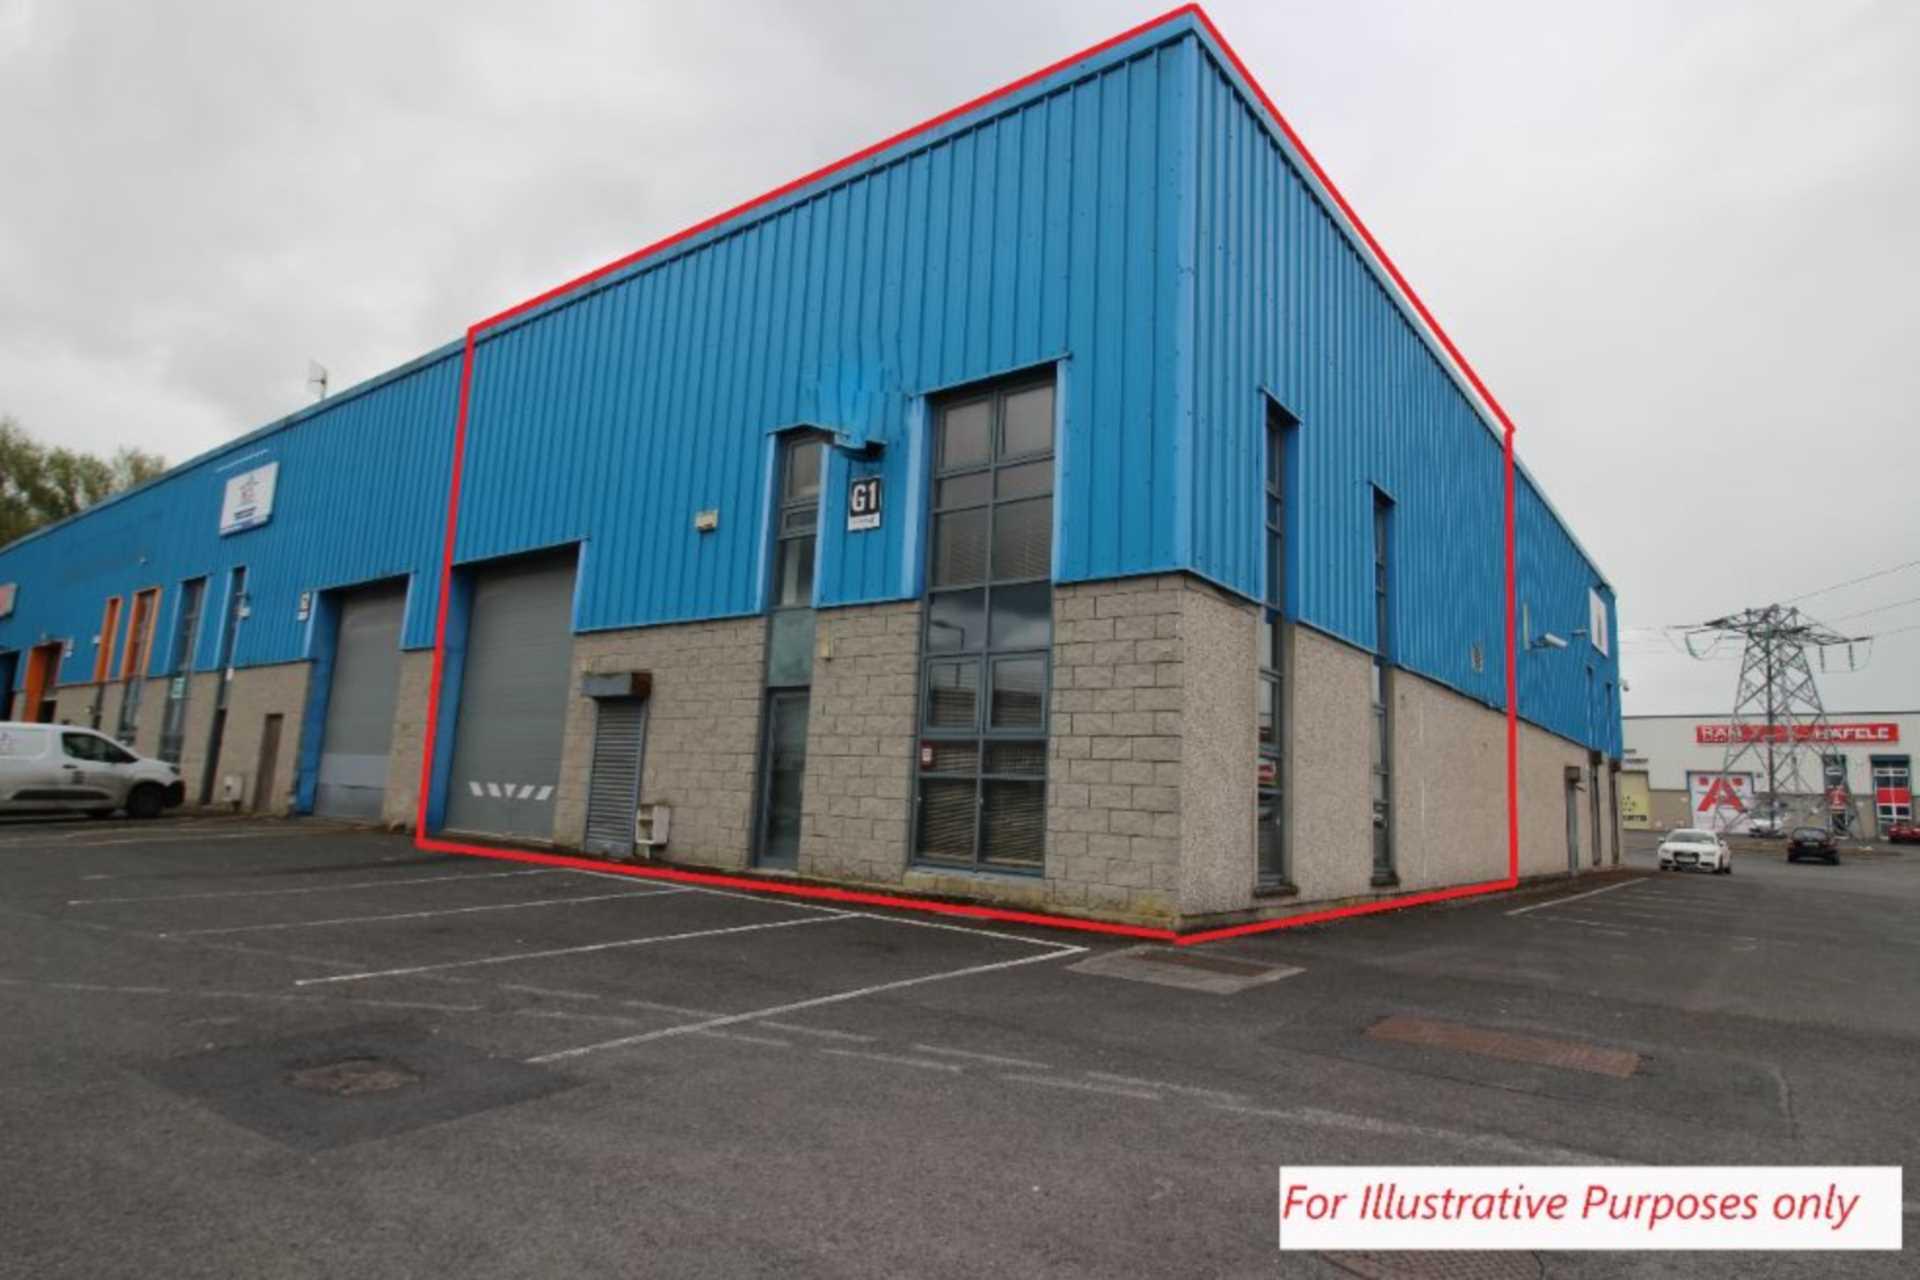 Unit G1, Eastway Business Park, Ballysimom Road, Co. Limerick